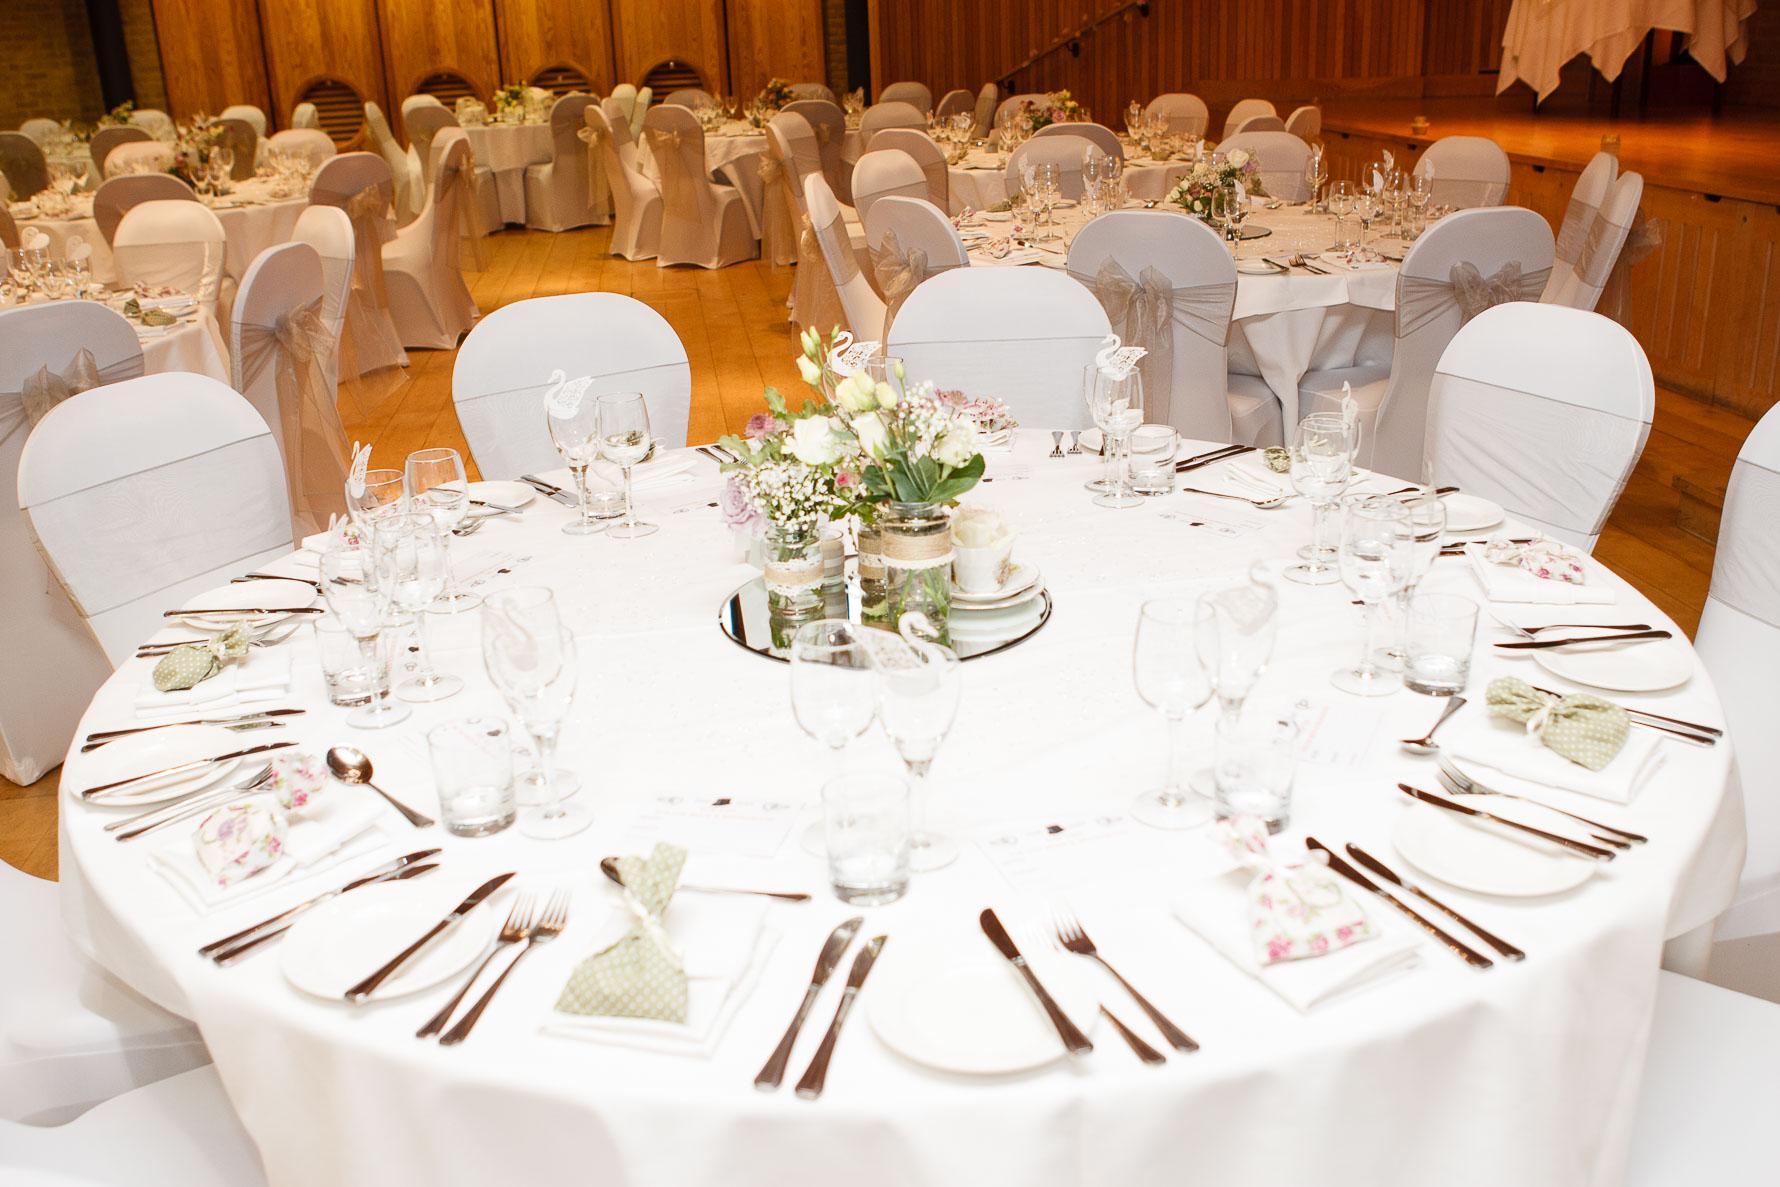 Canterbury Cathedral Lodge Wedding50-20141004 0787